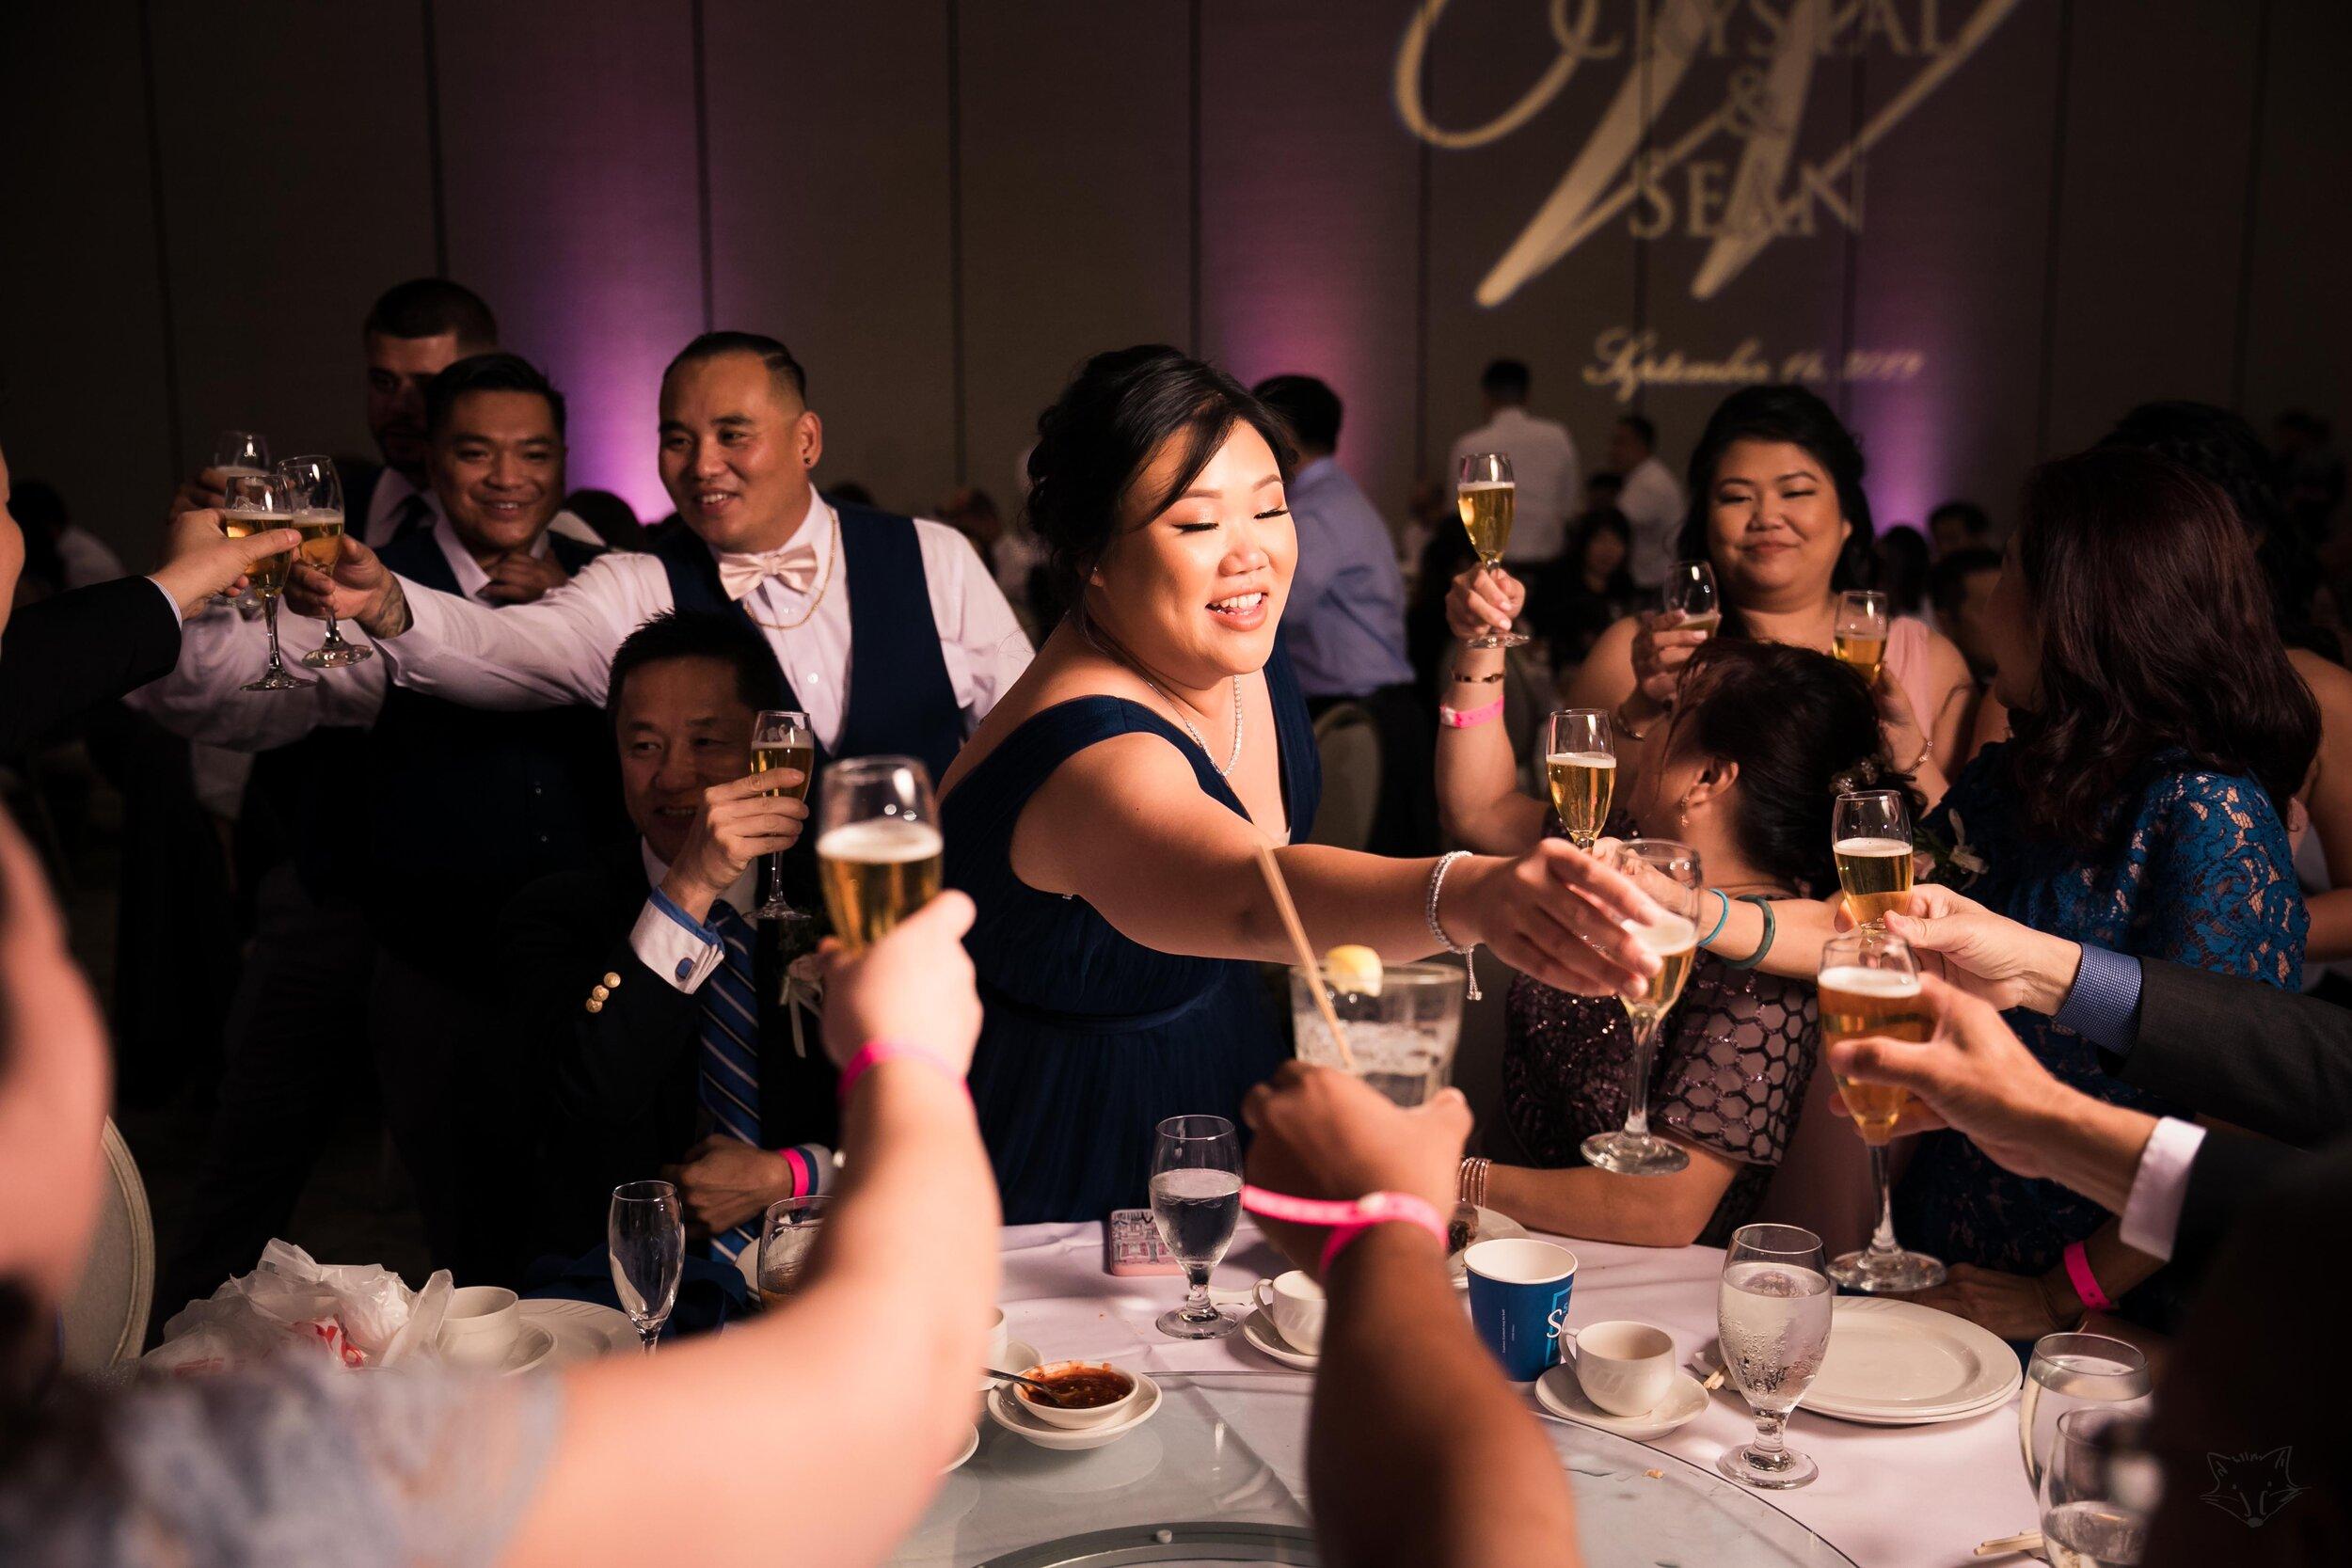 san_gabriel_hilton_wedding_joshua_chun_photography-8313.jpg